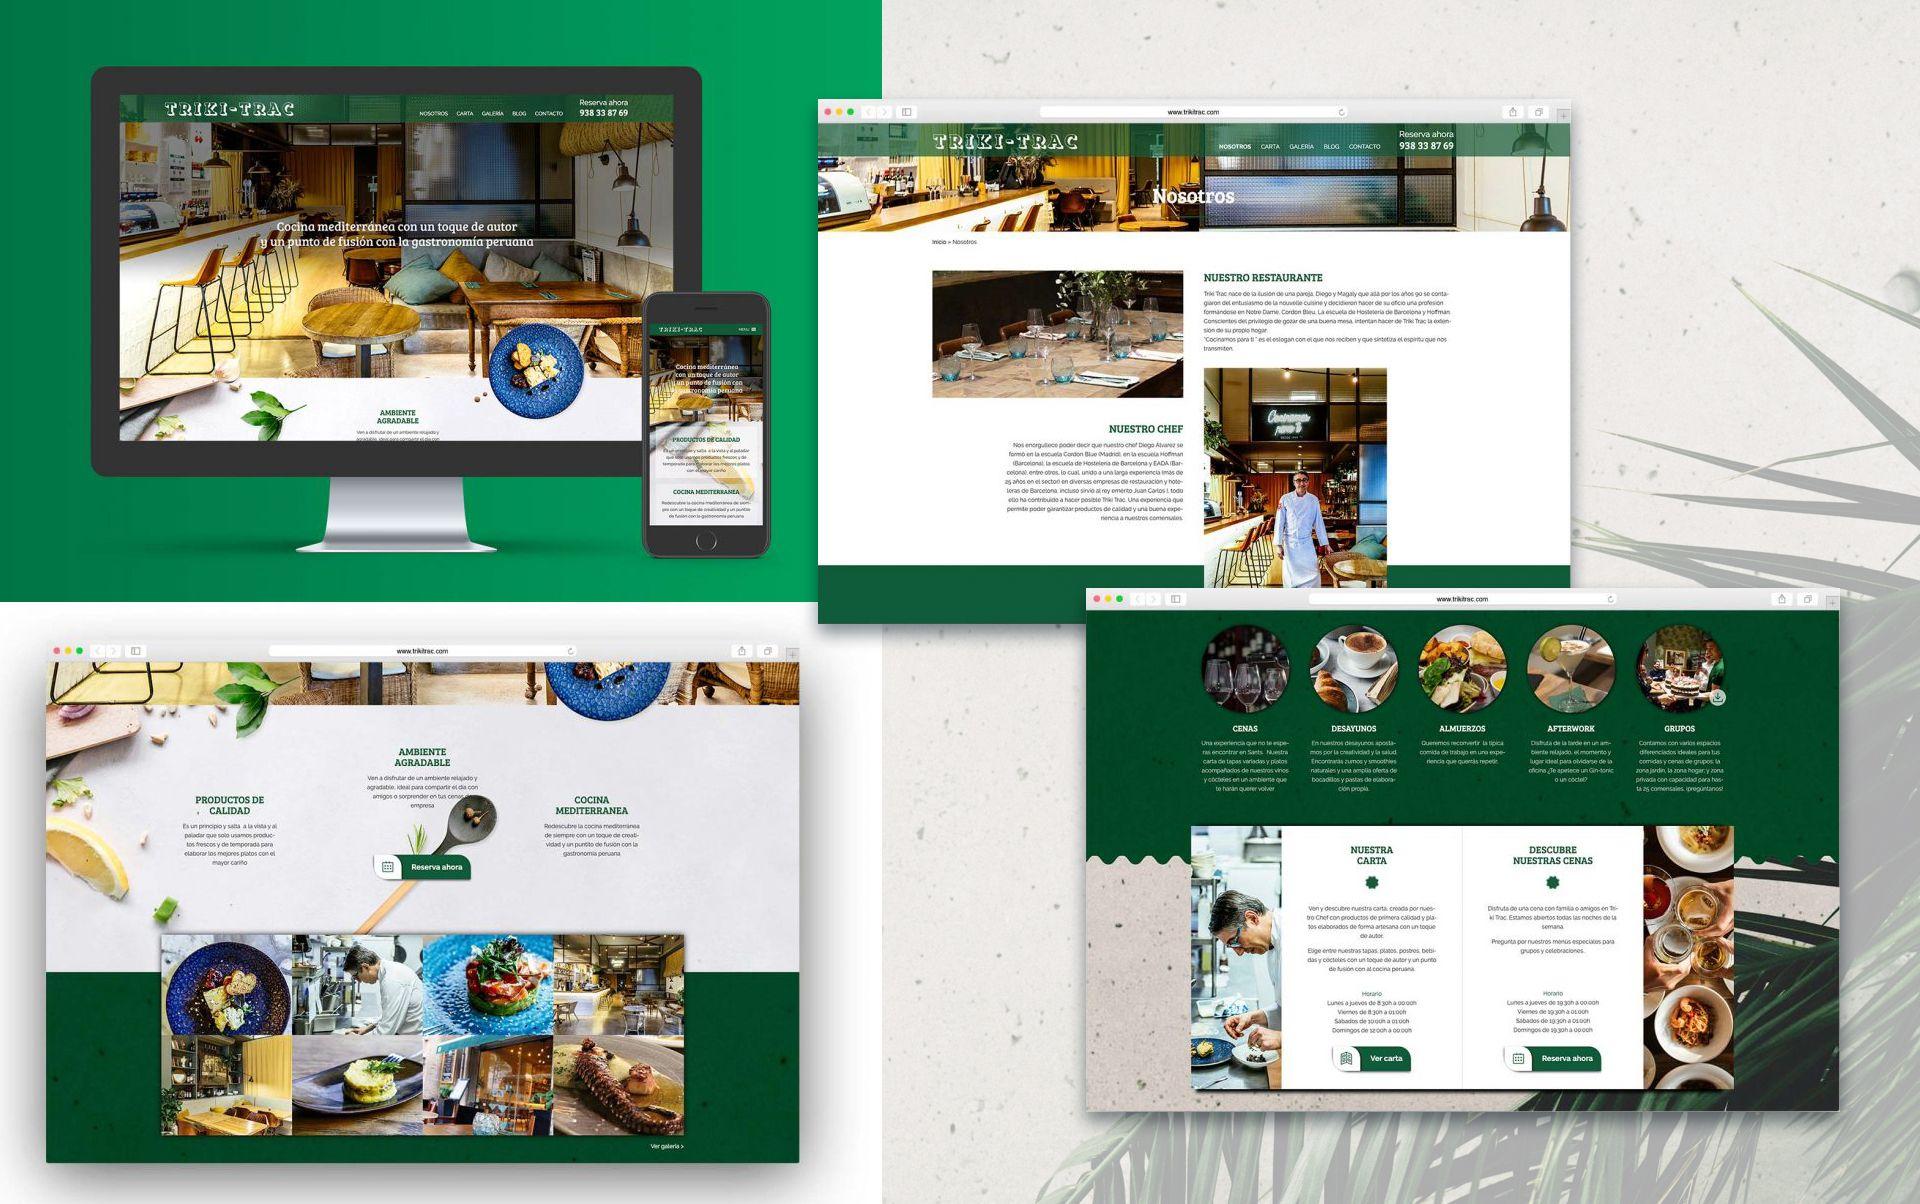 Restaurante barcelona web - Diseño web restaurante de Barcelona